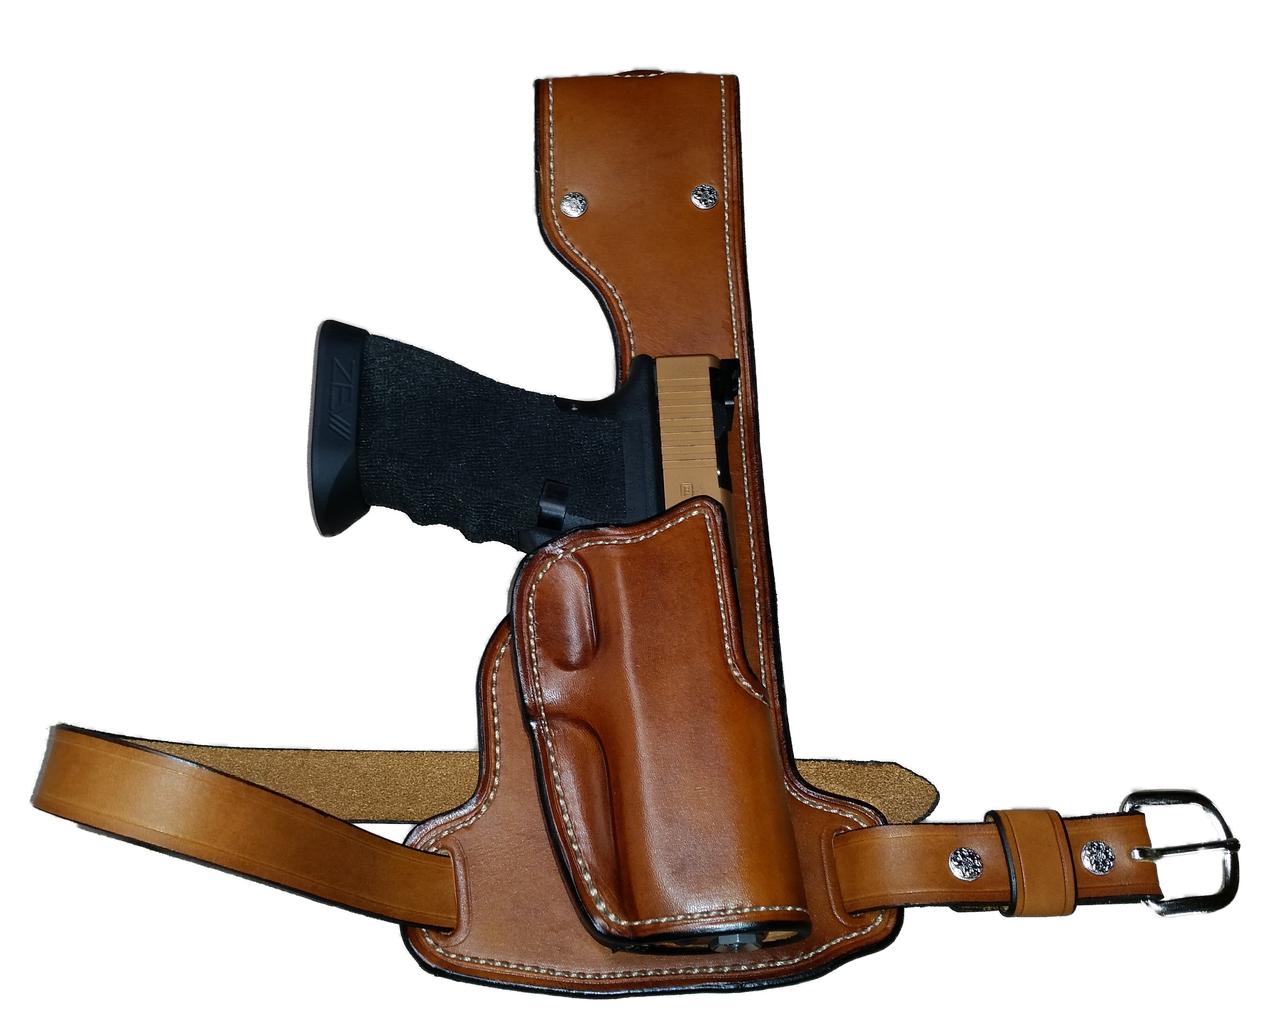 Custom Dropleg Style Holster - Style #1